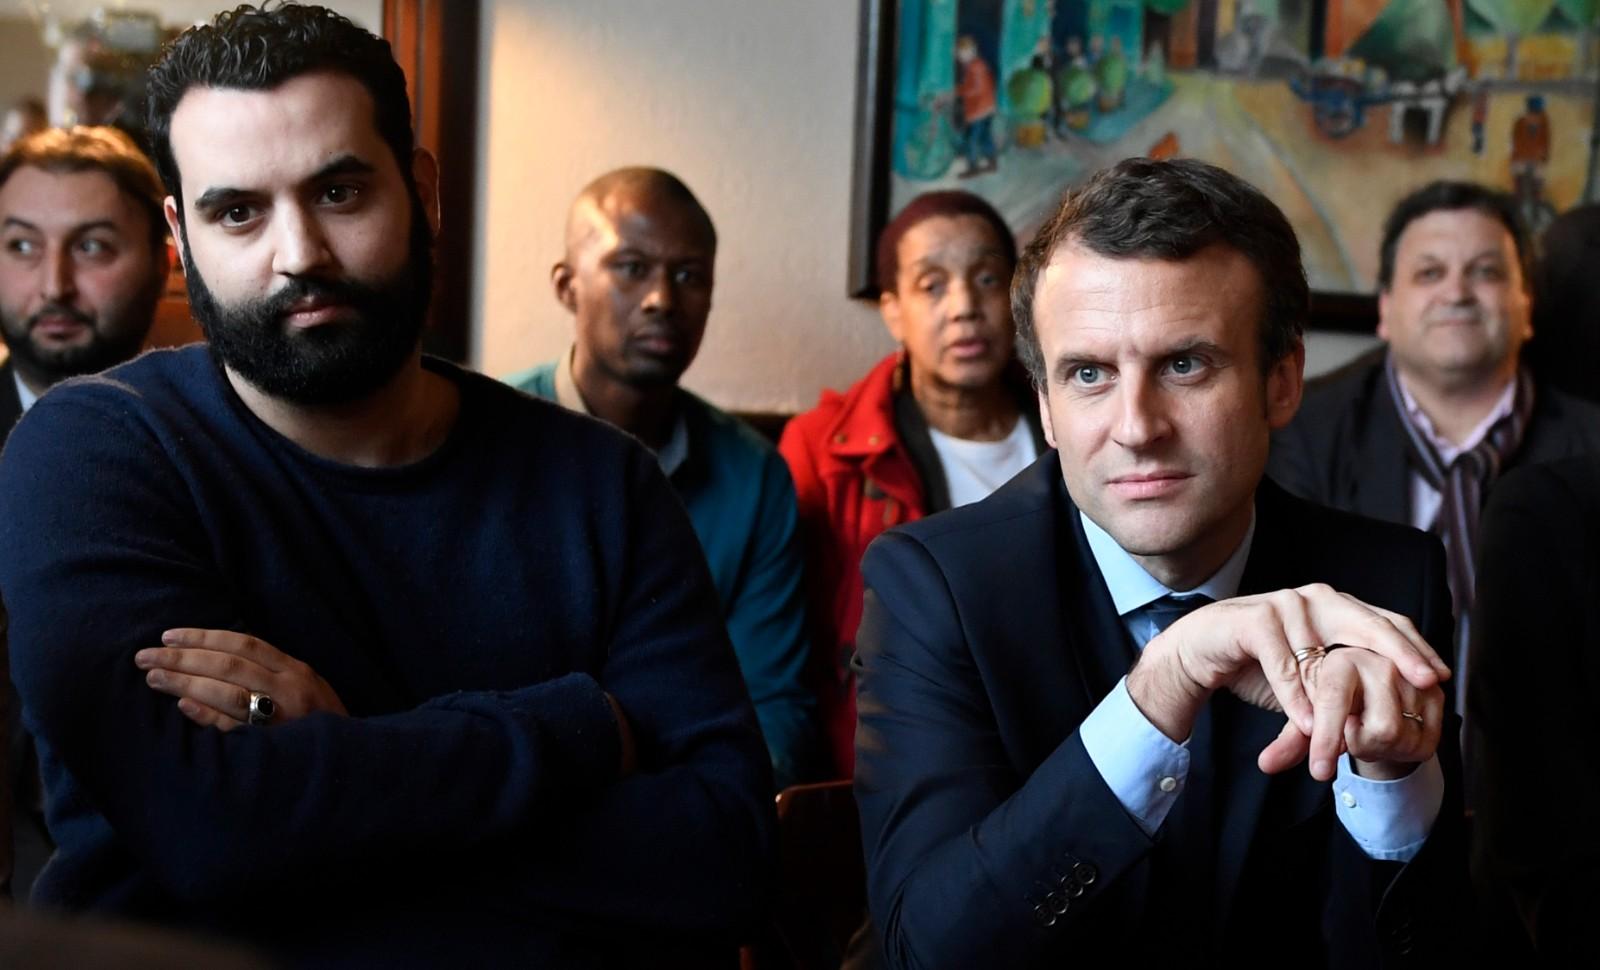 Yassine Belattar et Emmanuel Macron en 2017 © ERIC FEFERBERG / AFP